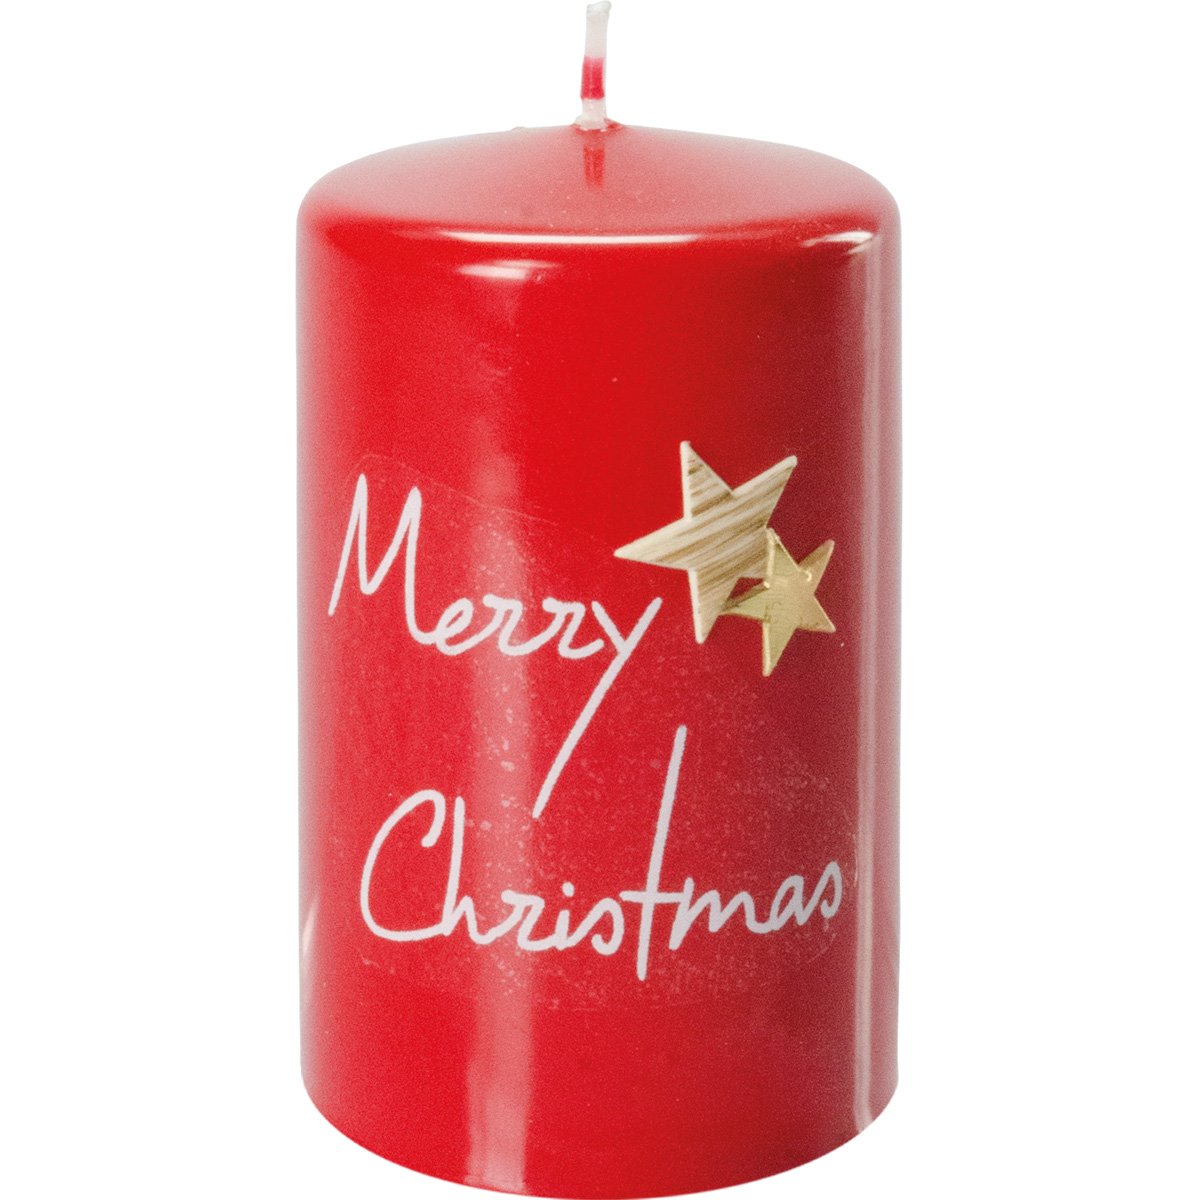 Weihnachtskerze, #3015, 10 x 6 cm, rubin, Merry Christmas